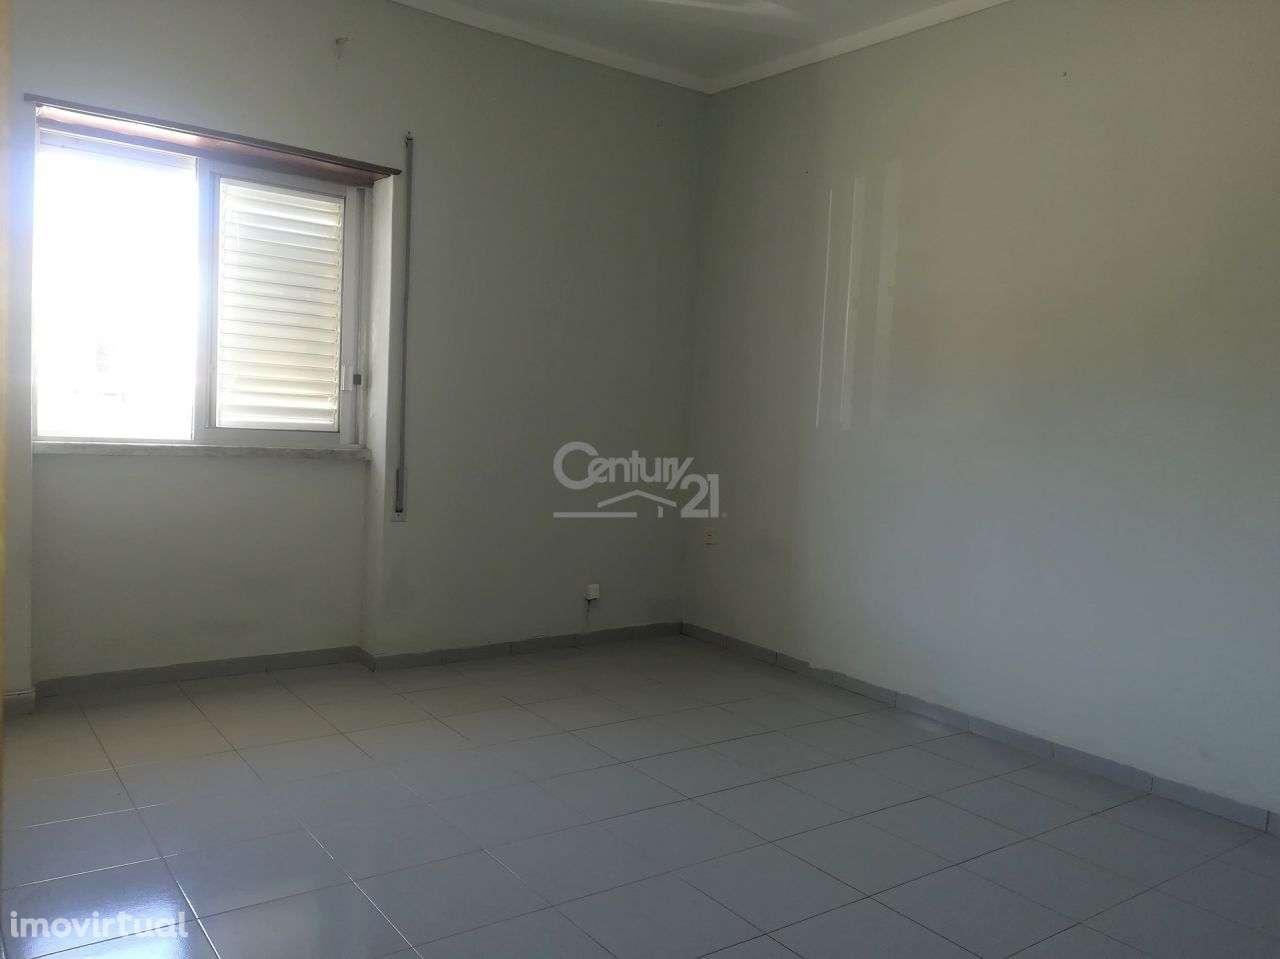 Apartamento para comprar, Baixa da Banheira e Vale da Amoreira, Moita, Setúbal - Foto 6